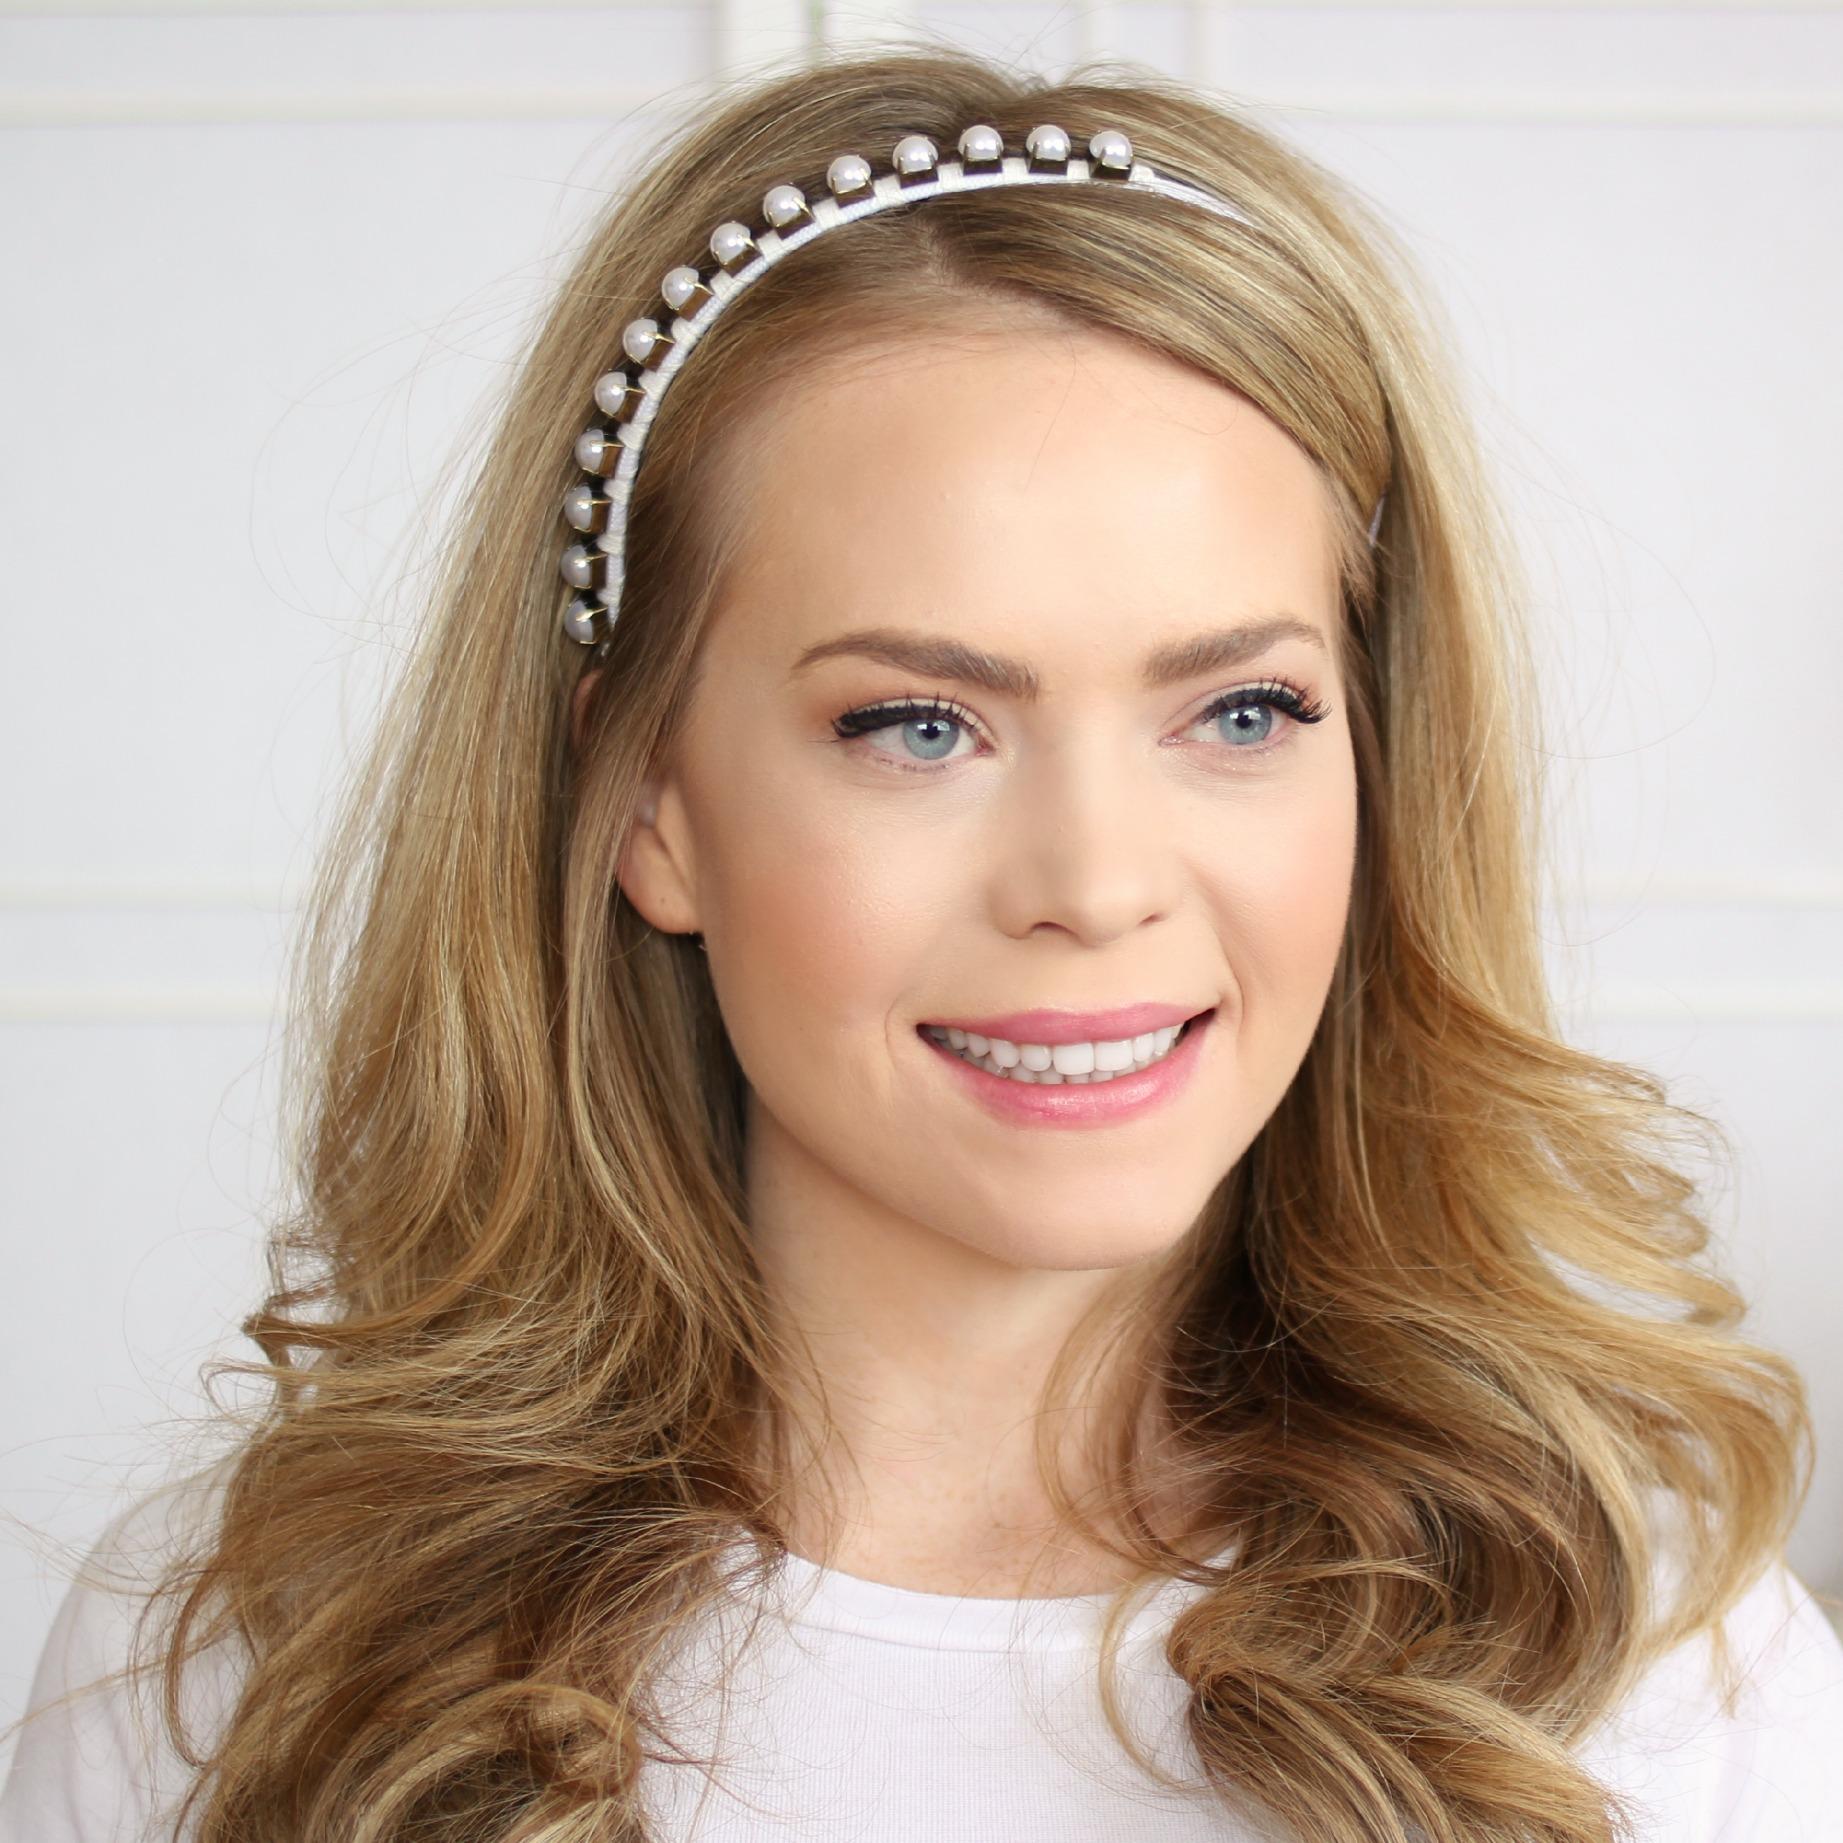 Headband Hairstyle | MISSY SUE